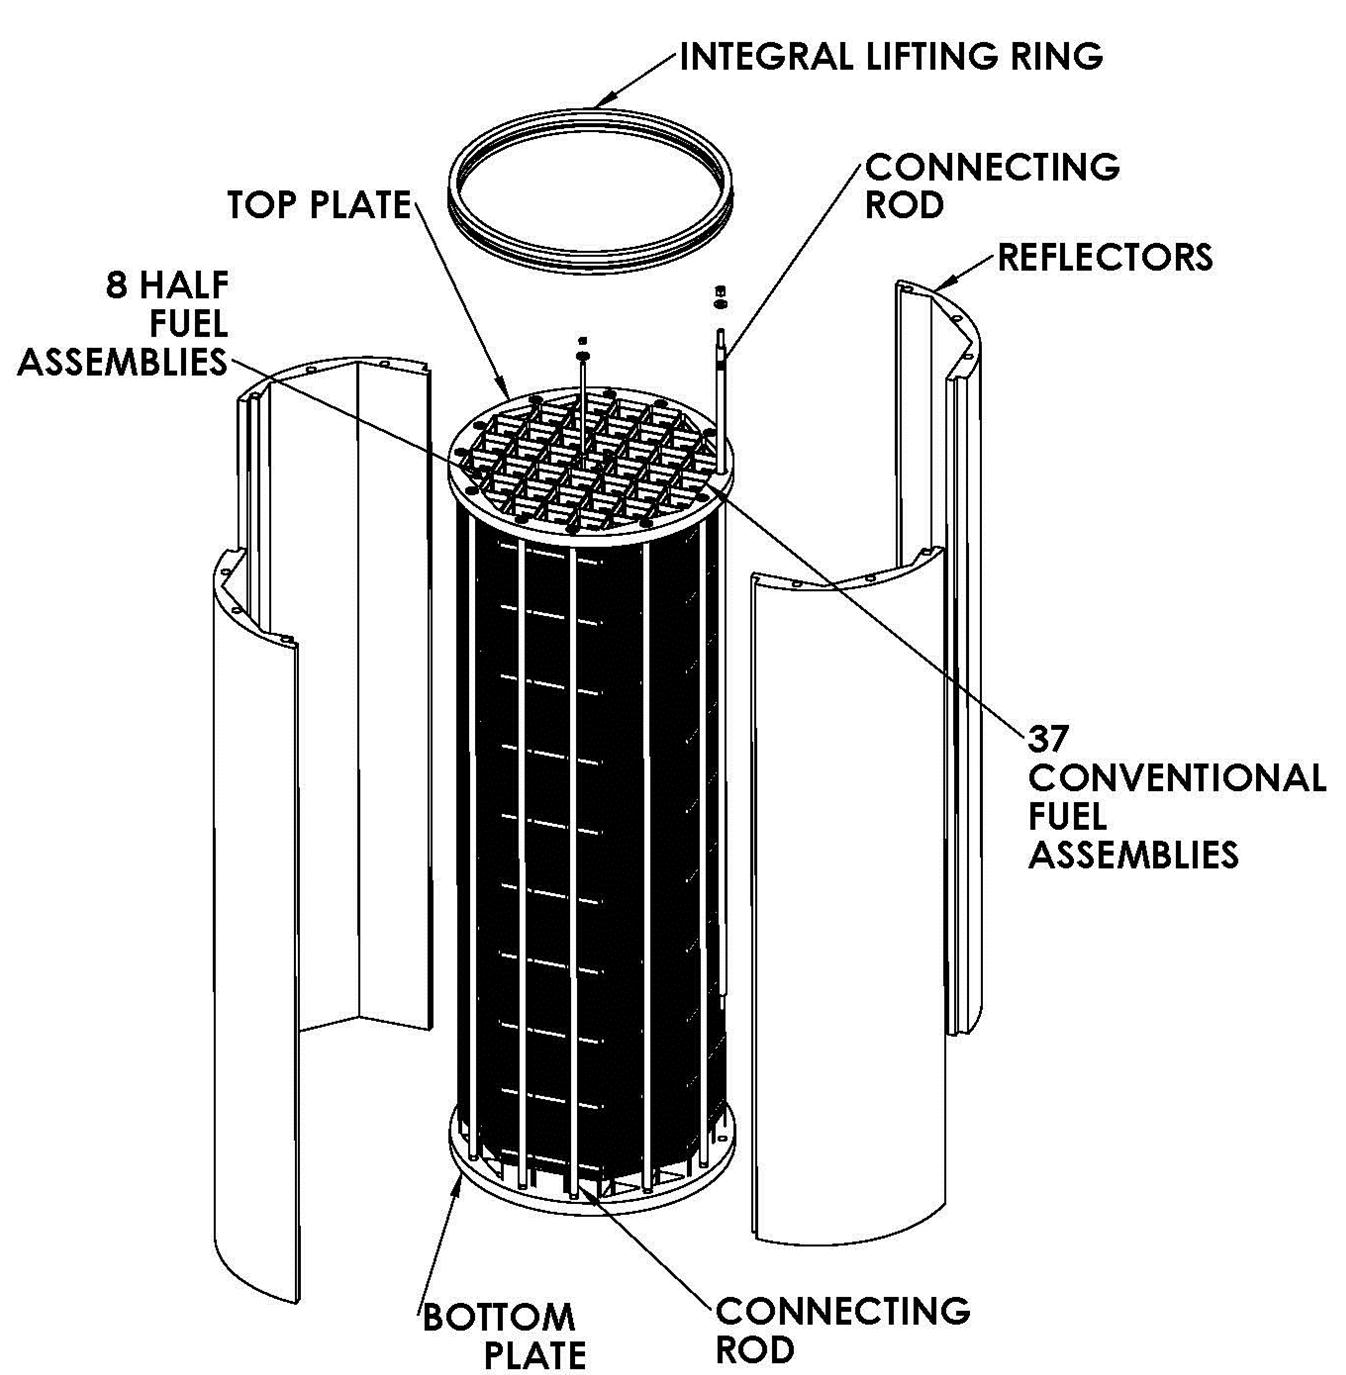 Breakthrough in SMR-160 Core Design